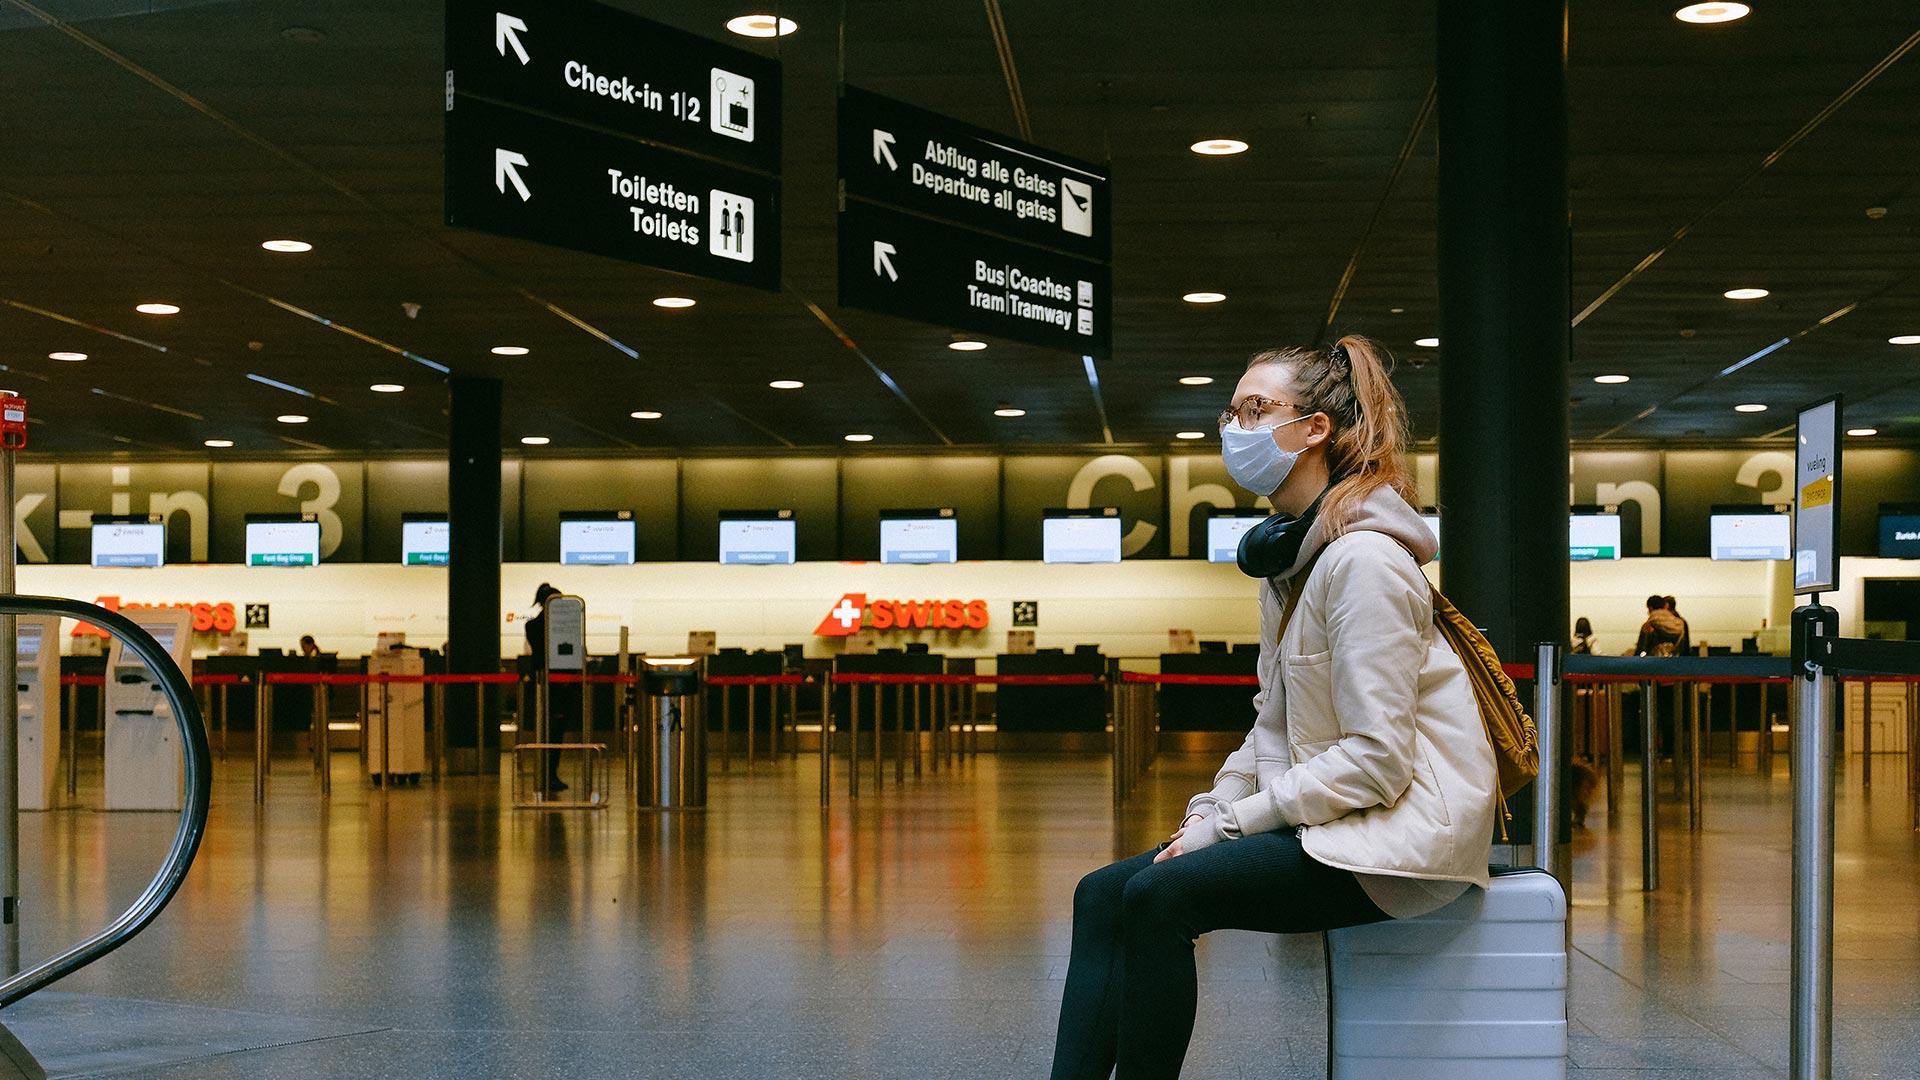 Reopening tourism in Europe